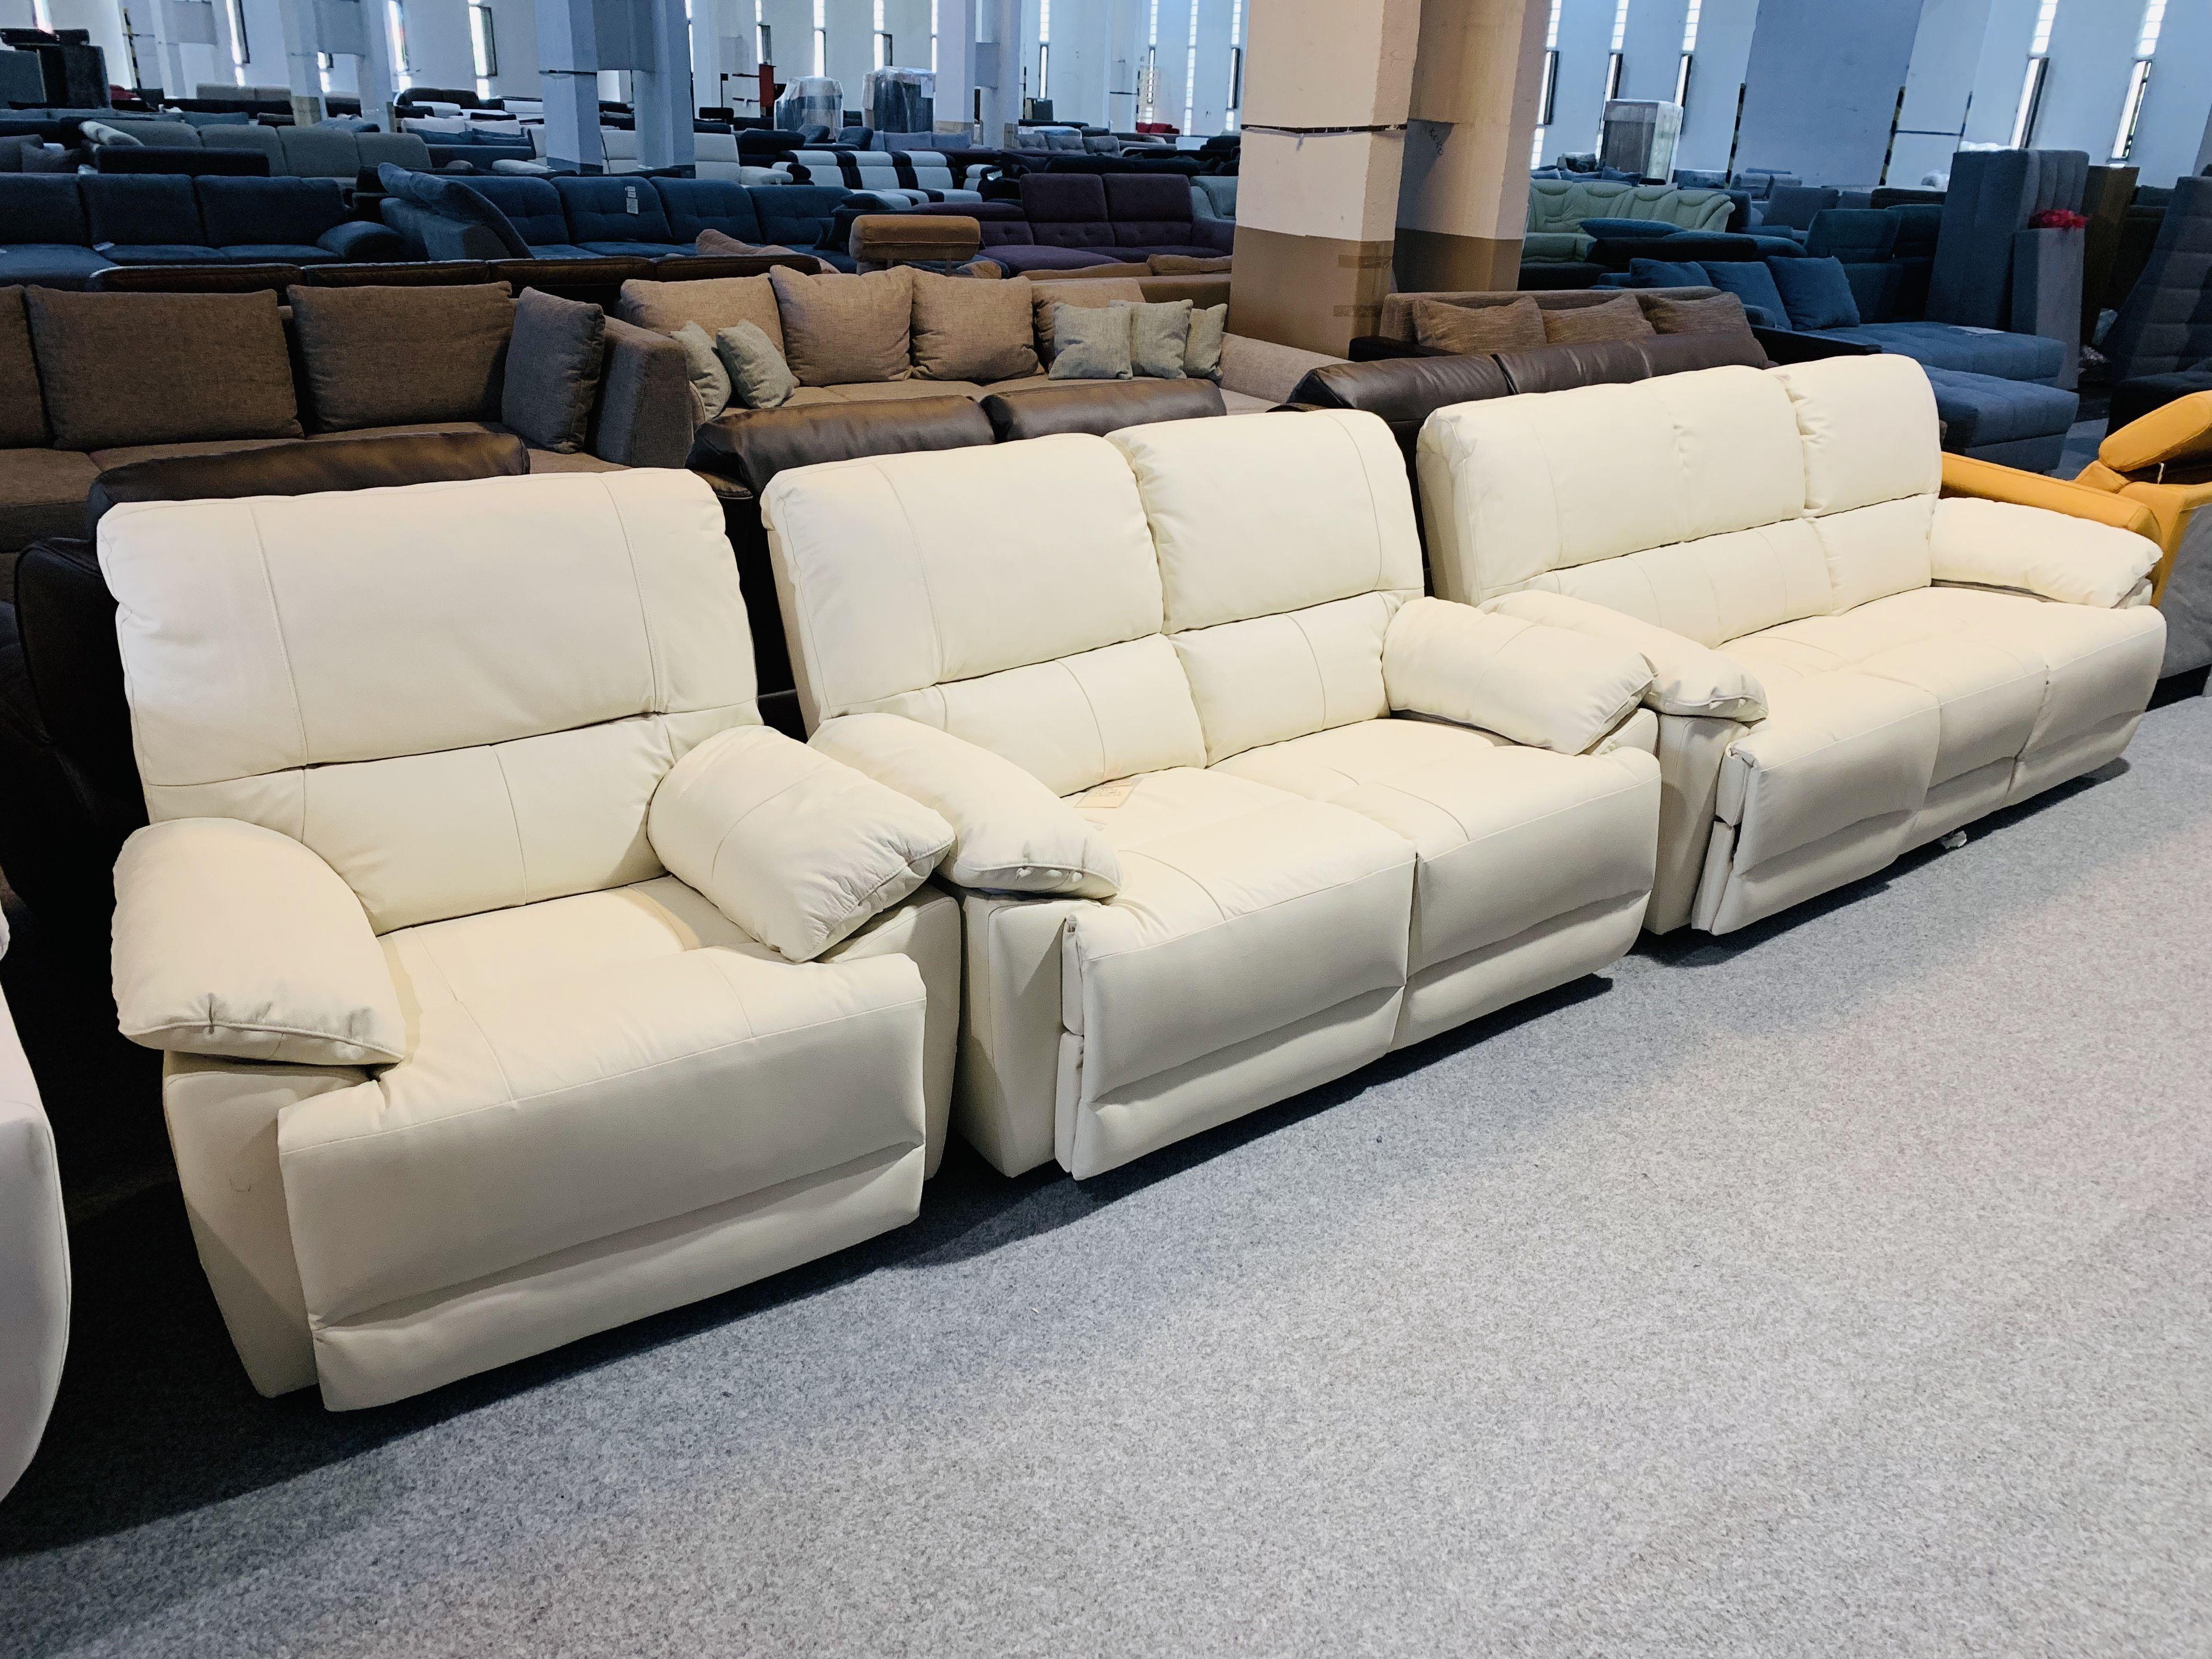 Buffalo 3 2 1 Ara 439 000 Ft Butorok Furniture Furniture Sofa Decor